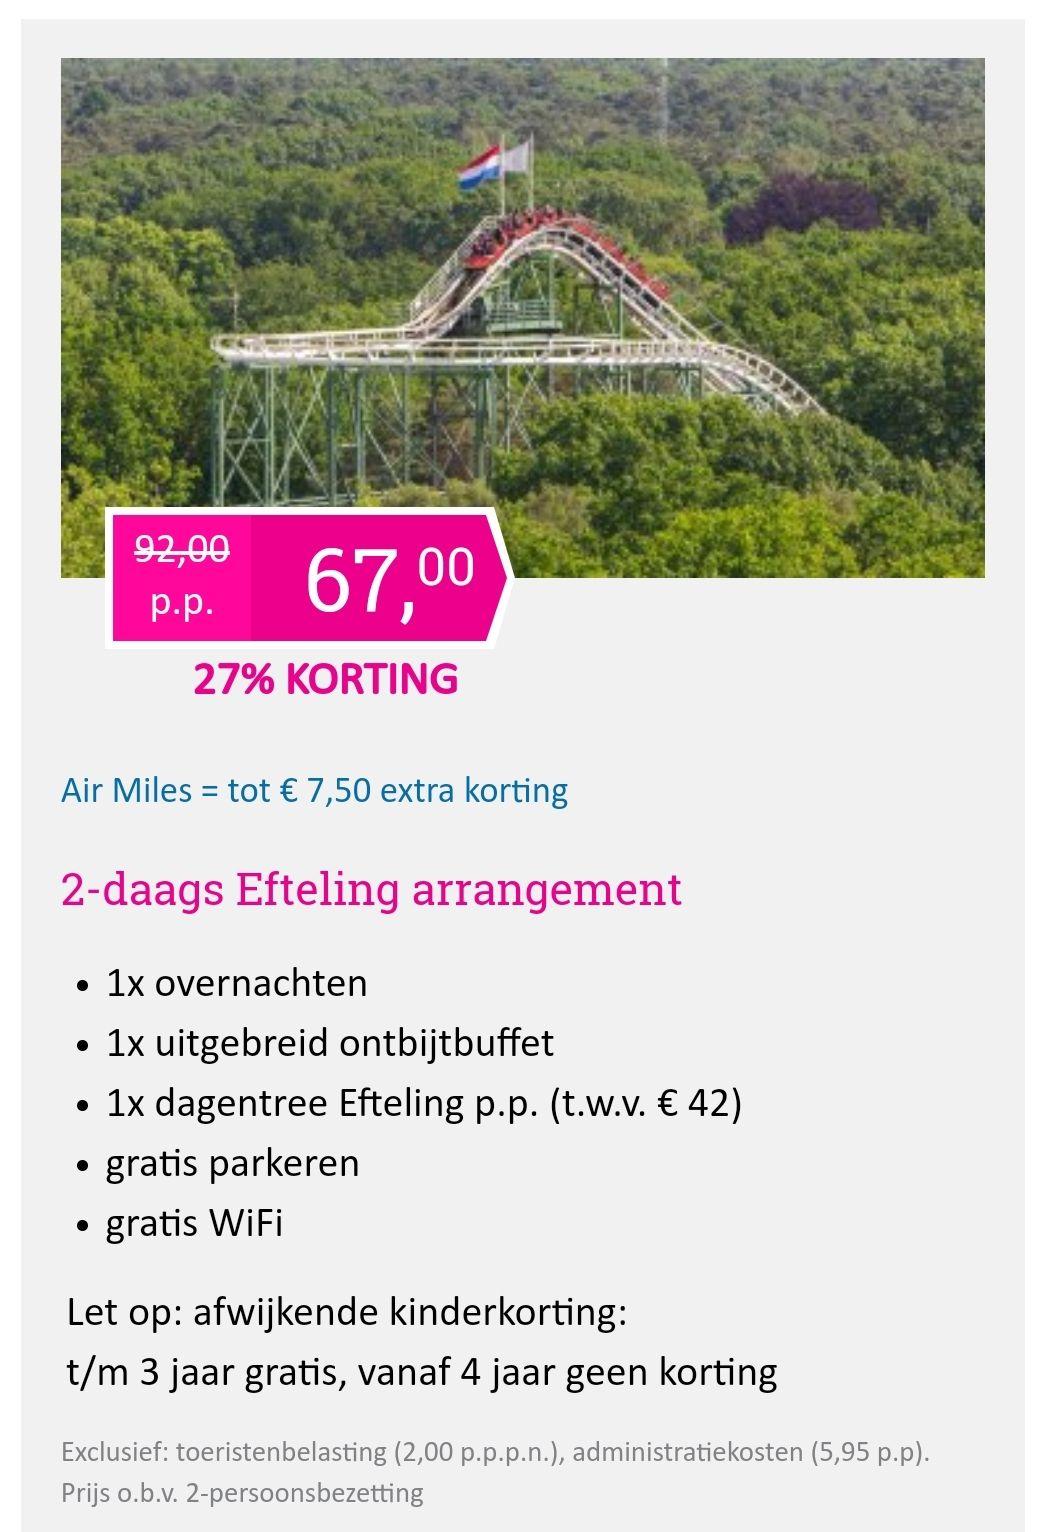 Efteling arrangement in een 4*-hotel Incl. ontbijtbuffet + 1x dagentree Efteling (t.w.v. 42 euro)